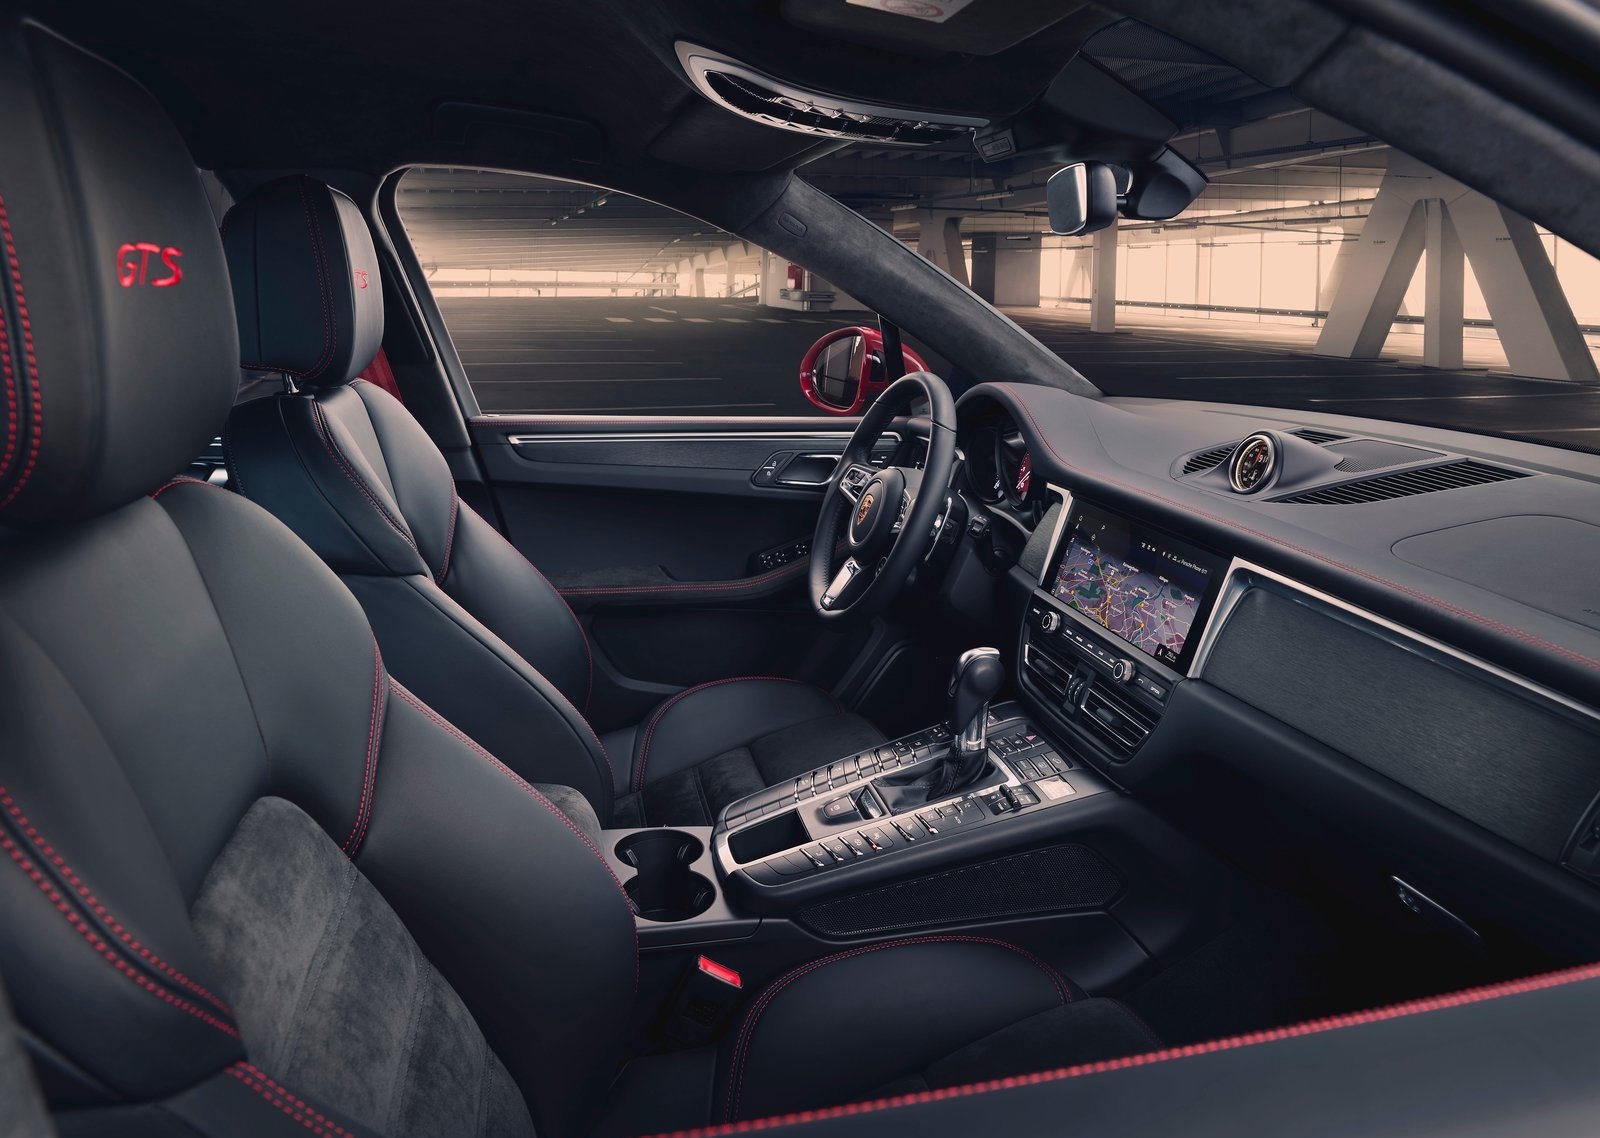 2020 Porsche Macan Gts Revealed Now On Sale In Australia Performancedrive